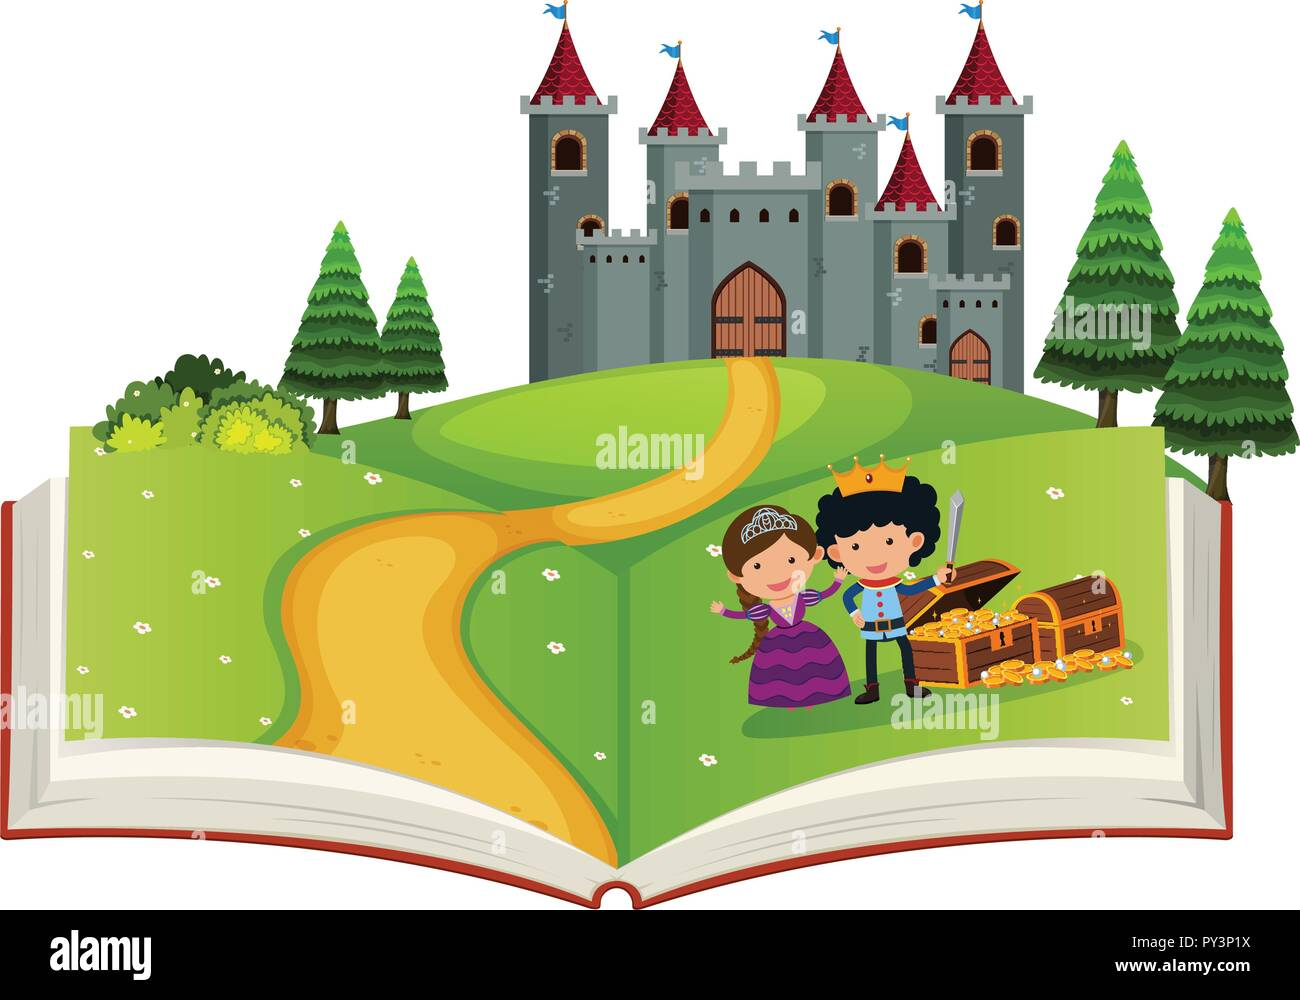 Open book fairy tale story illustration Stock Vector Art